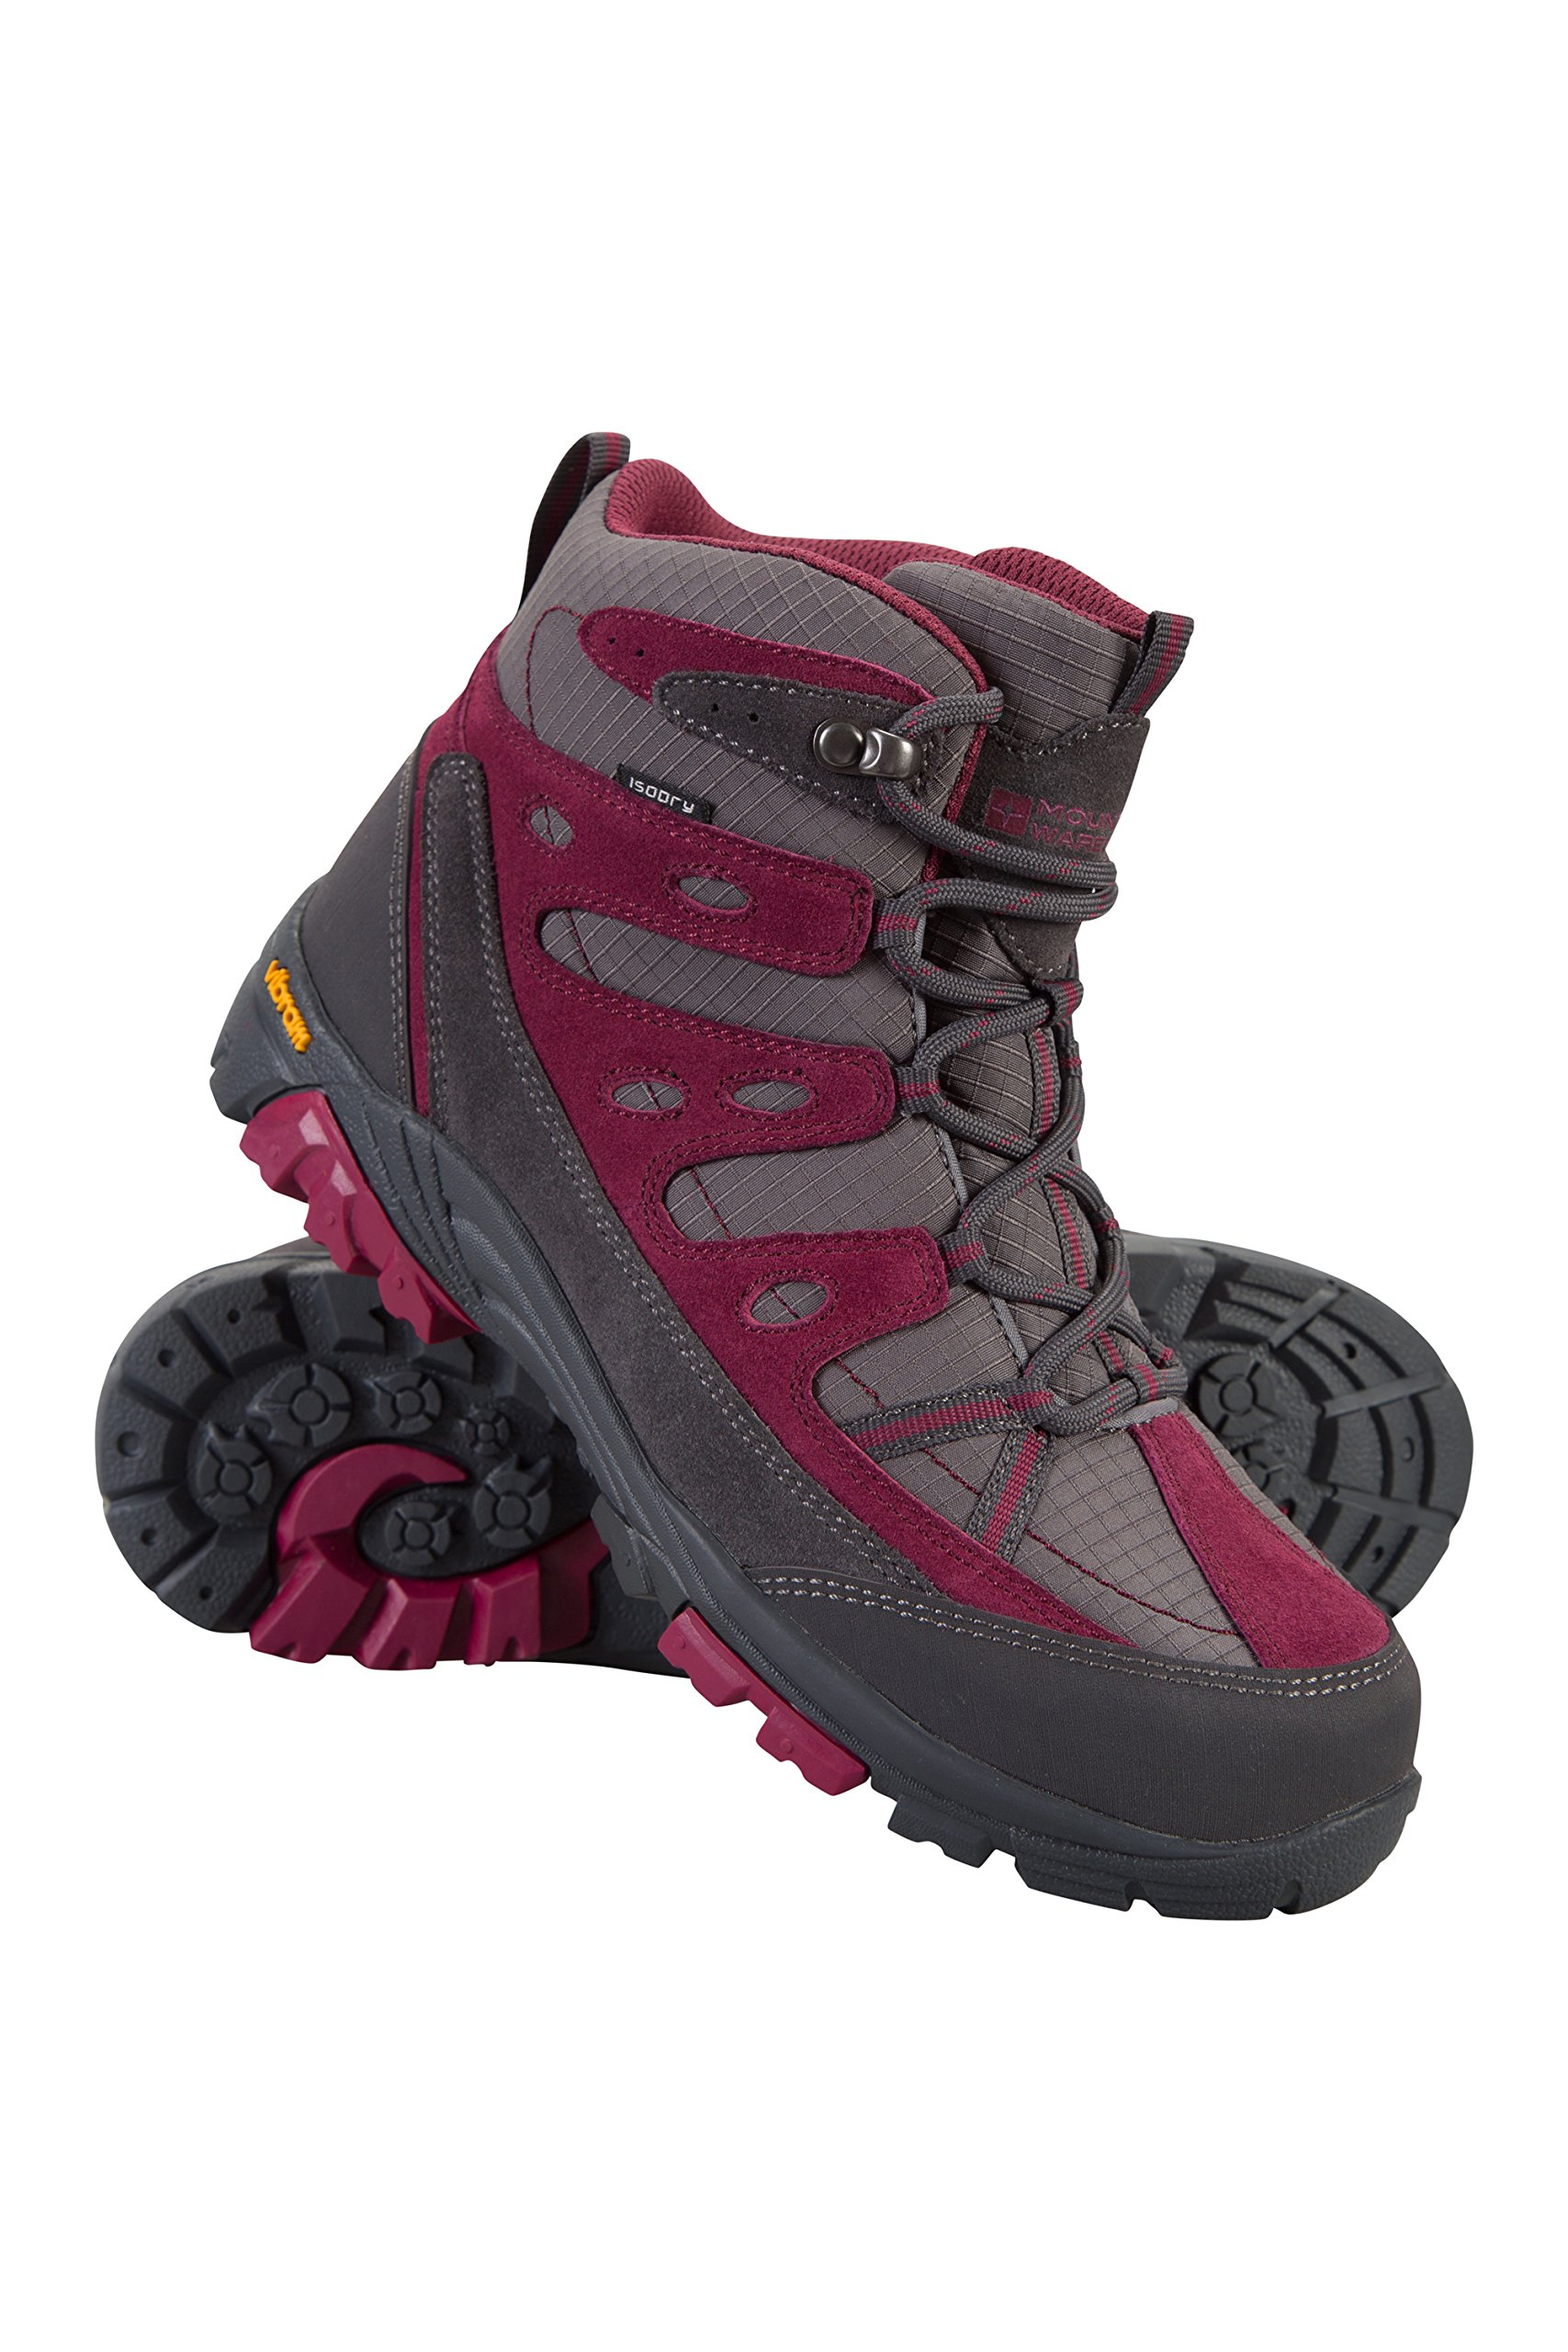 Mountain Warehouse Nevis Vibram Kids Boots -Childrens Summer Shoes Berry 5 Child US